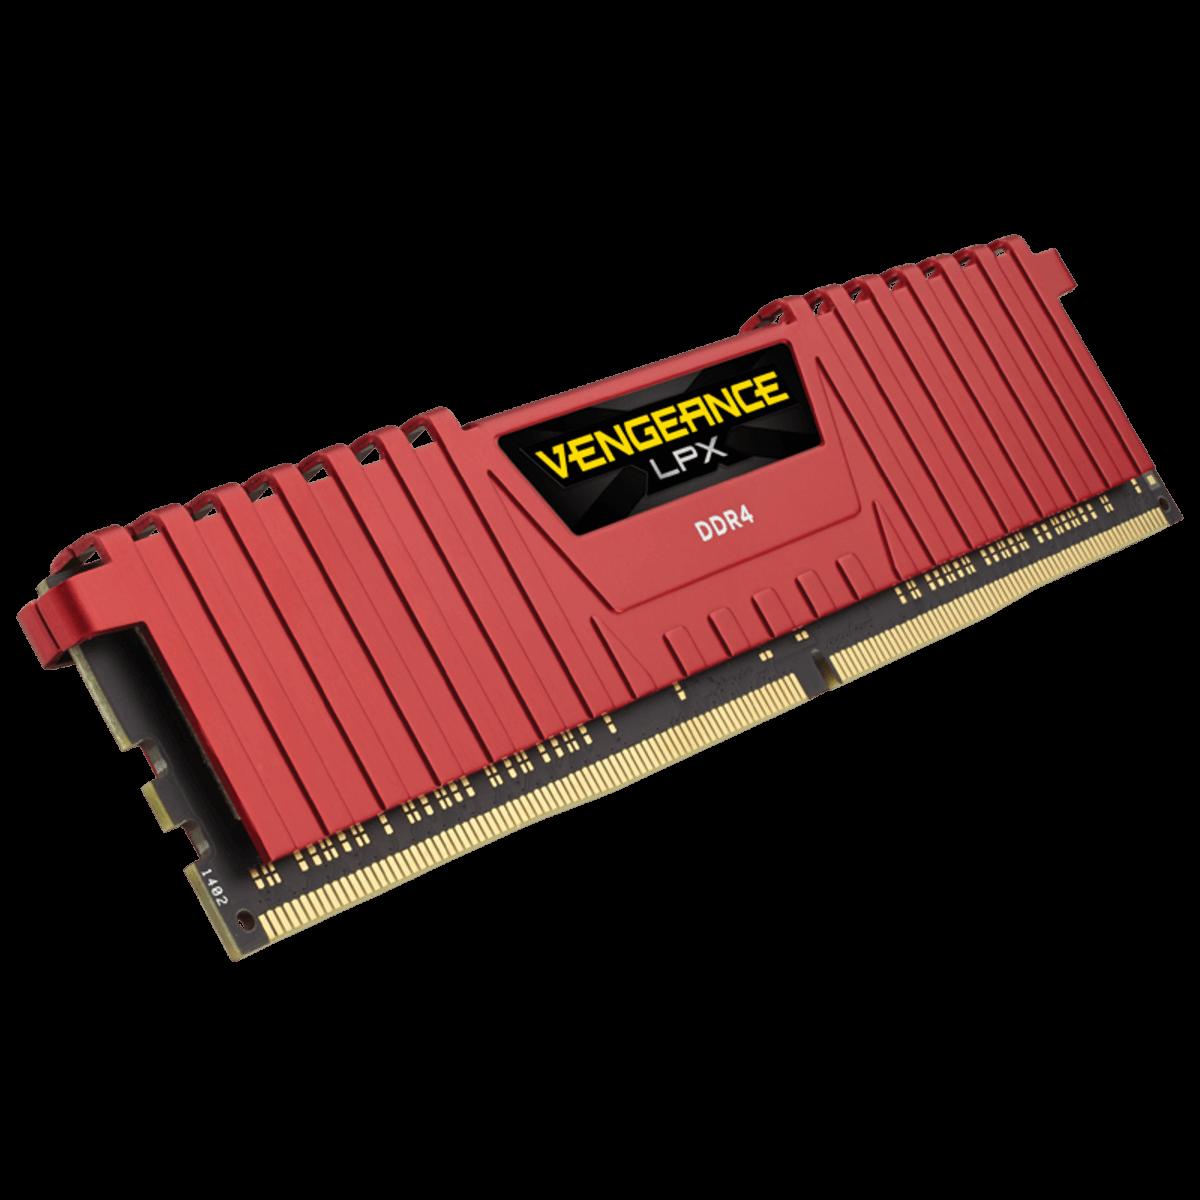 Kit Upgrade Gamer Gigabyte A320M M2  + Ryzen 5 2600 + 8GB DDR4